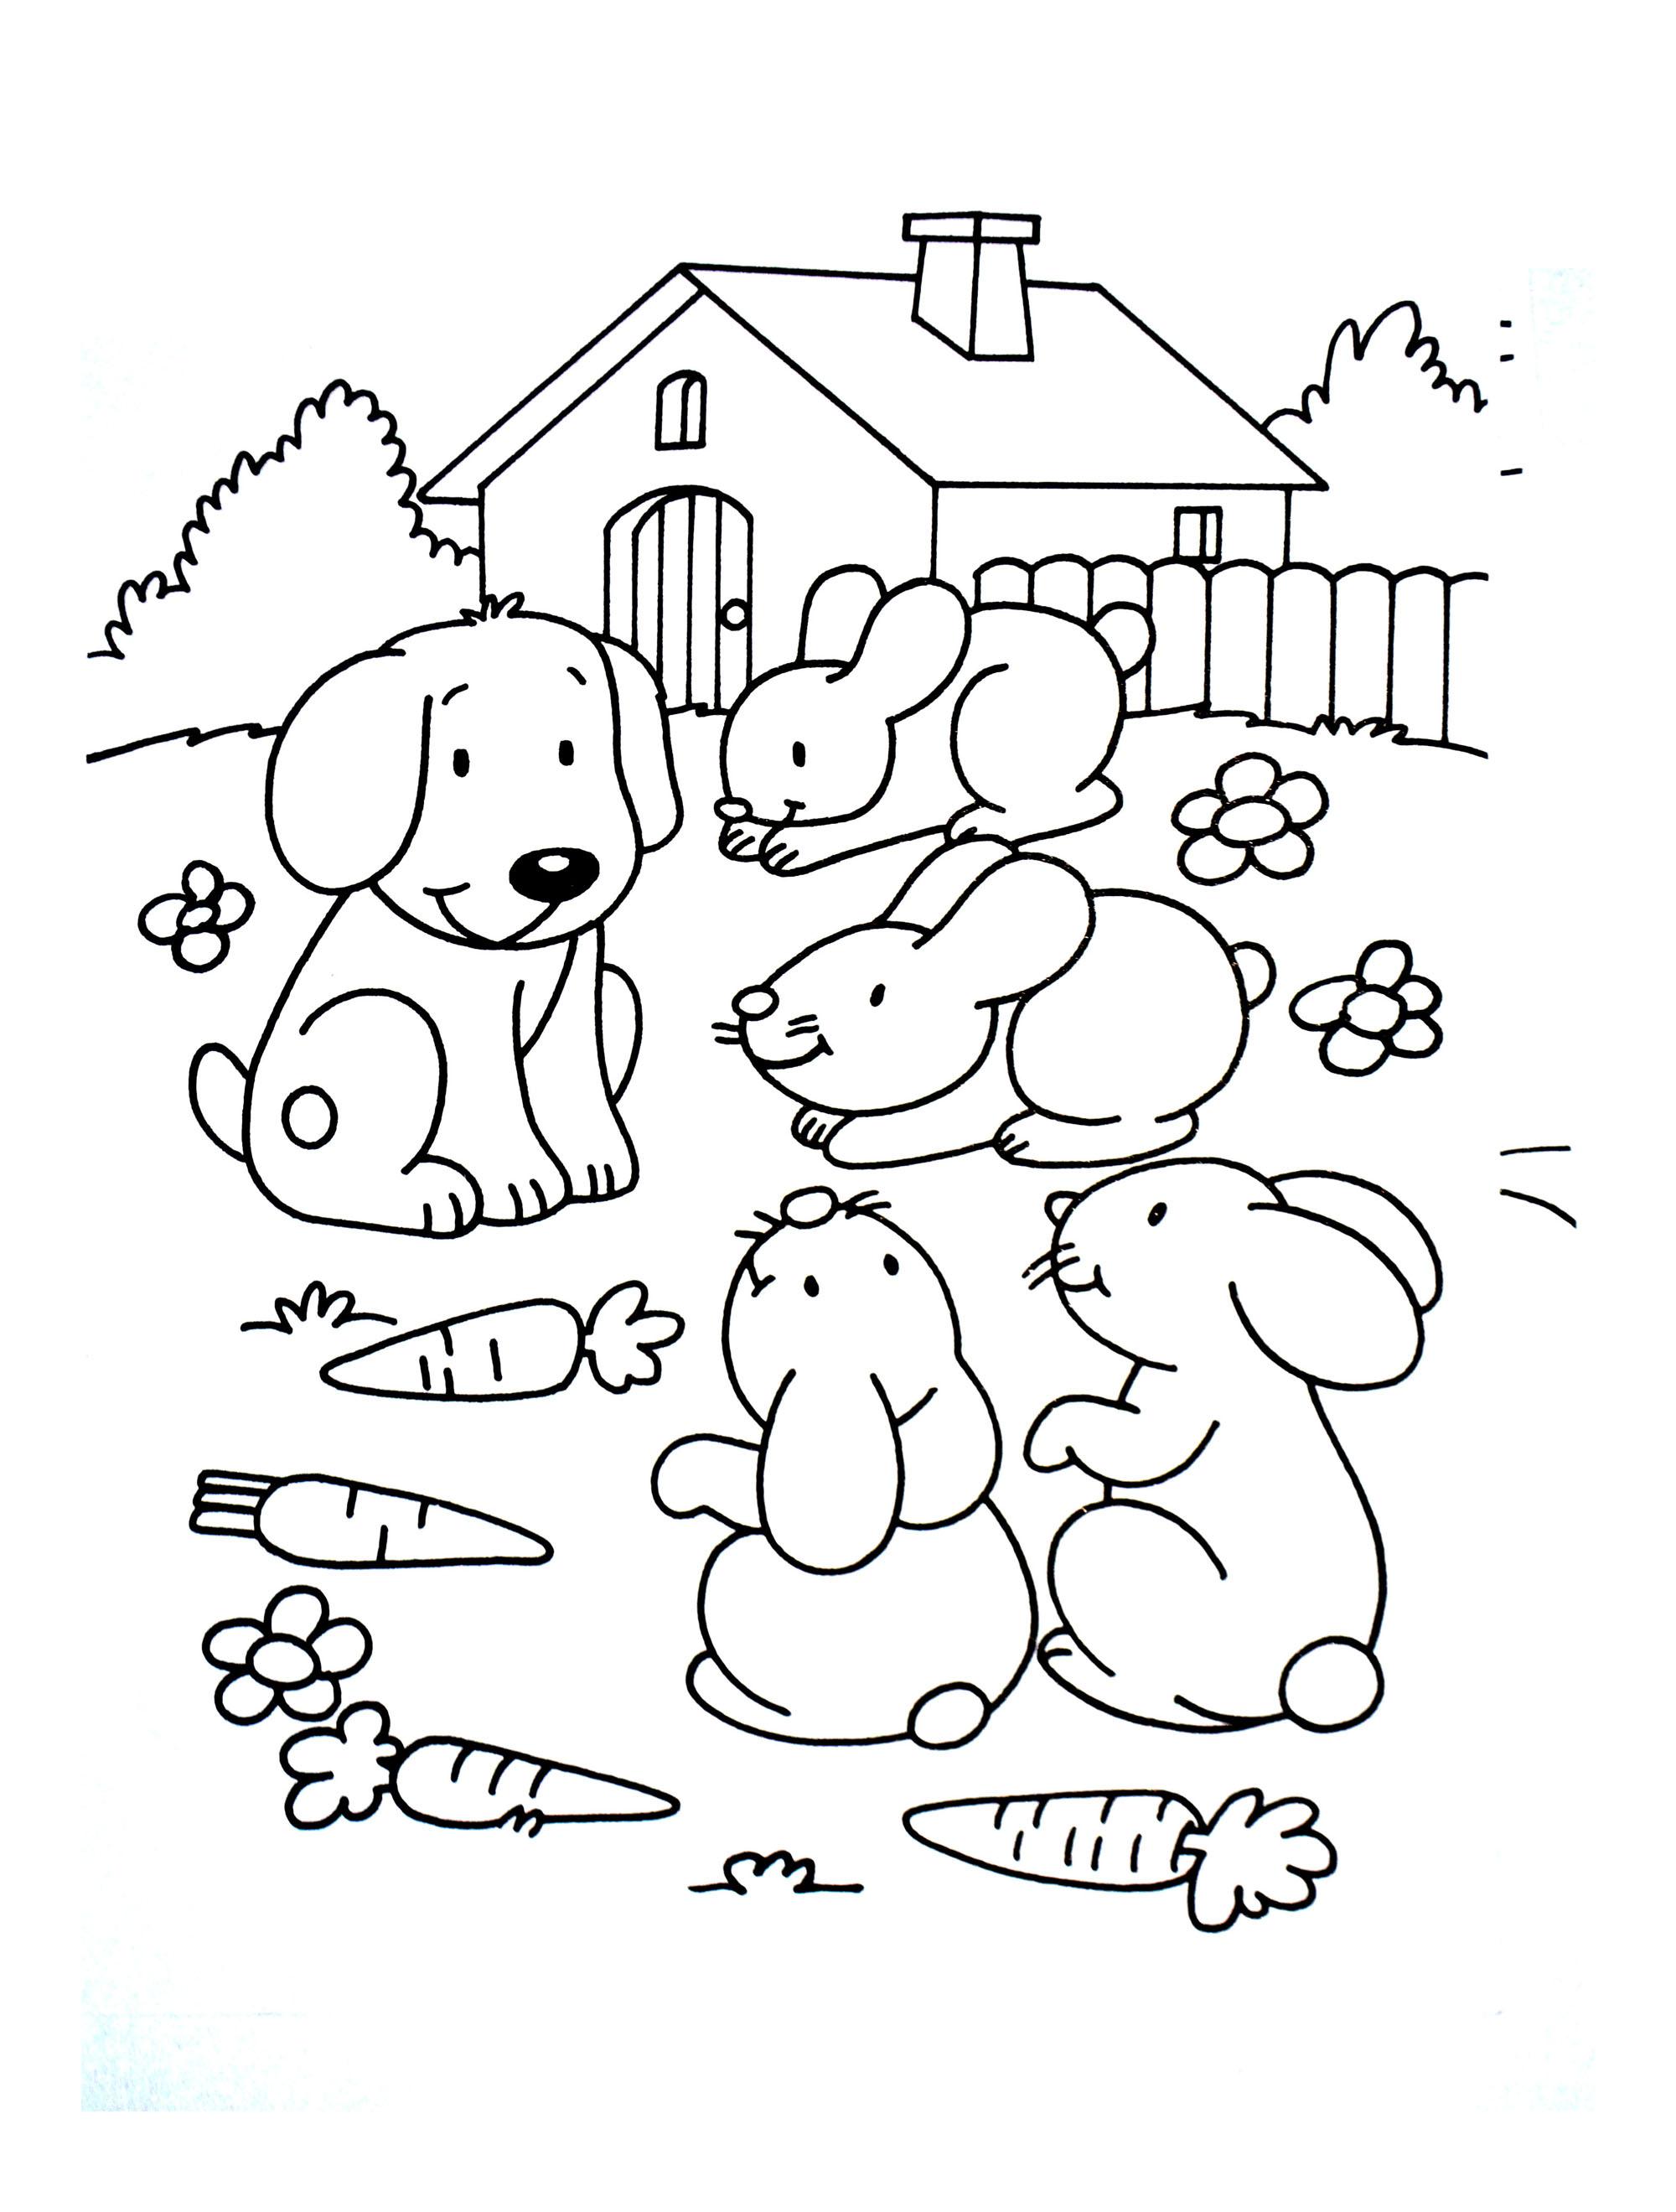 Splendid Rabbit Friends Dog Adults Dog Coloring Sheets Adults Dog Rabbit Friends Animals Adult Coloring Pages Dog Colouring Pages bark post Dog Coloring Pages For Adults